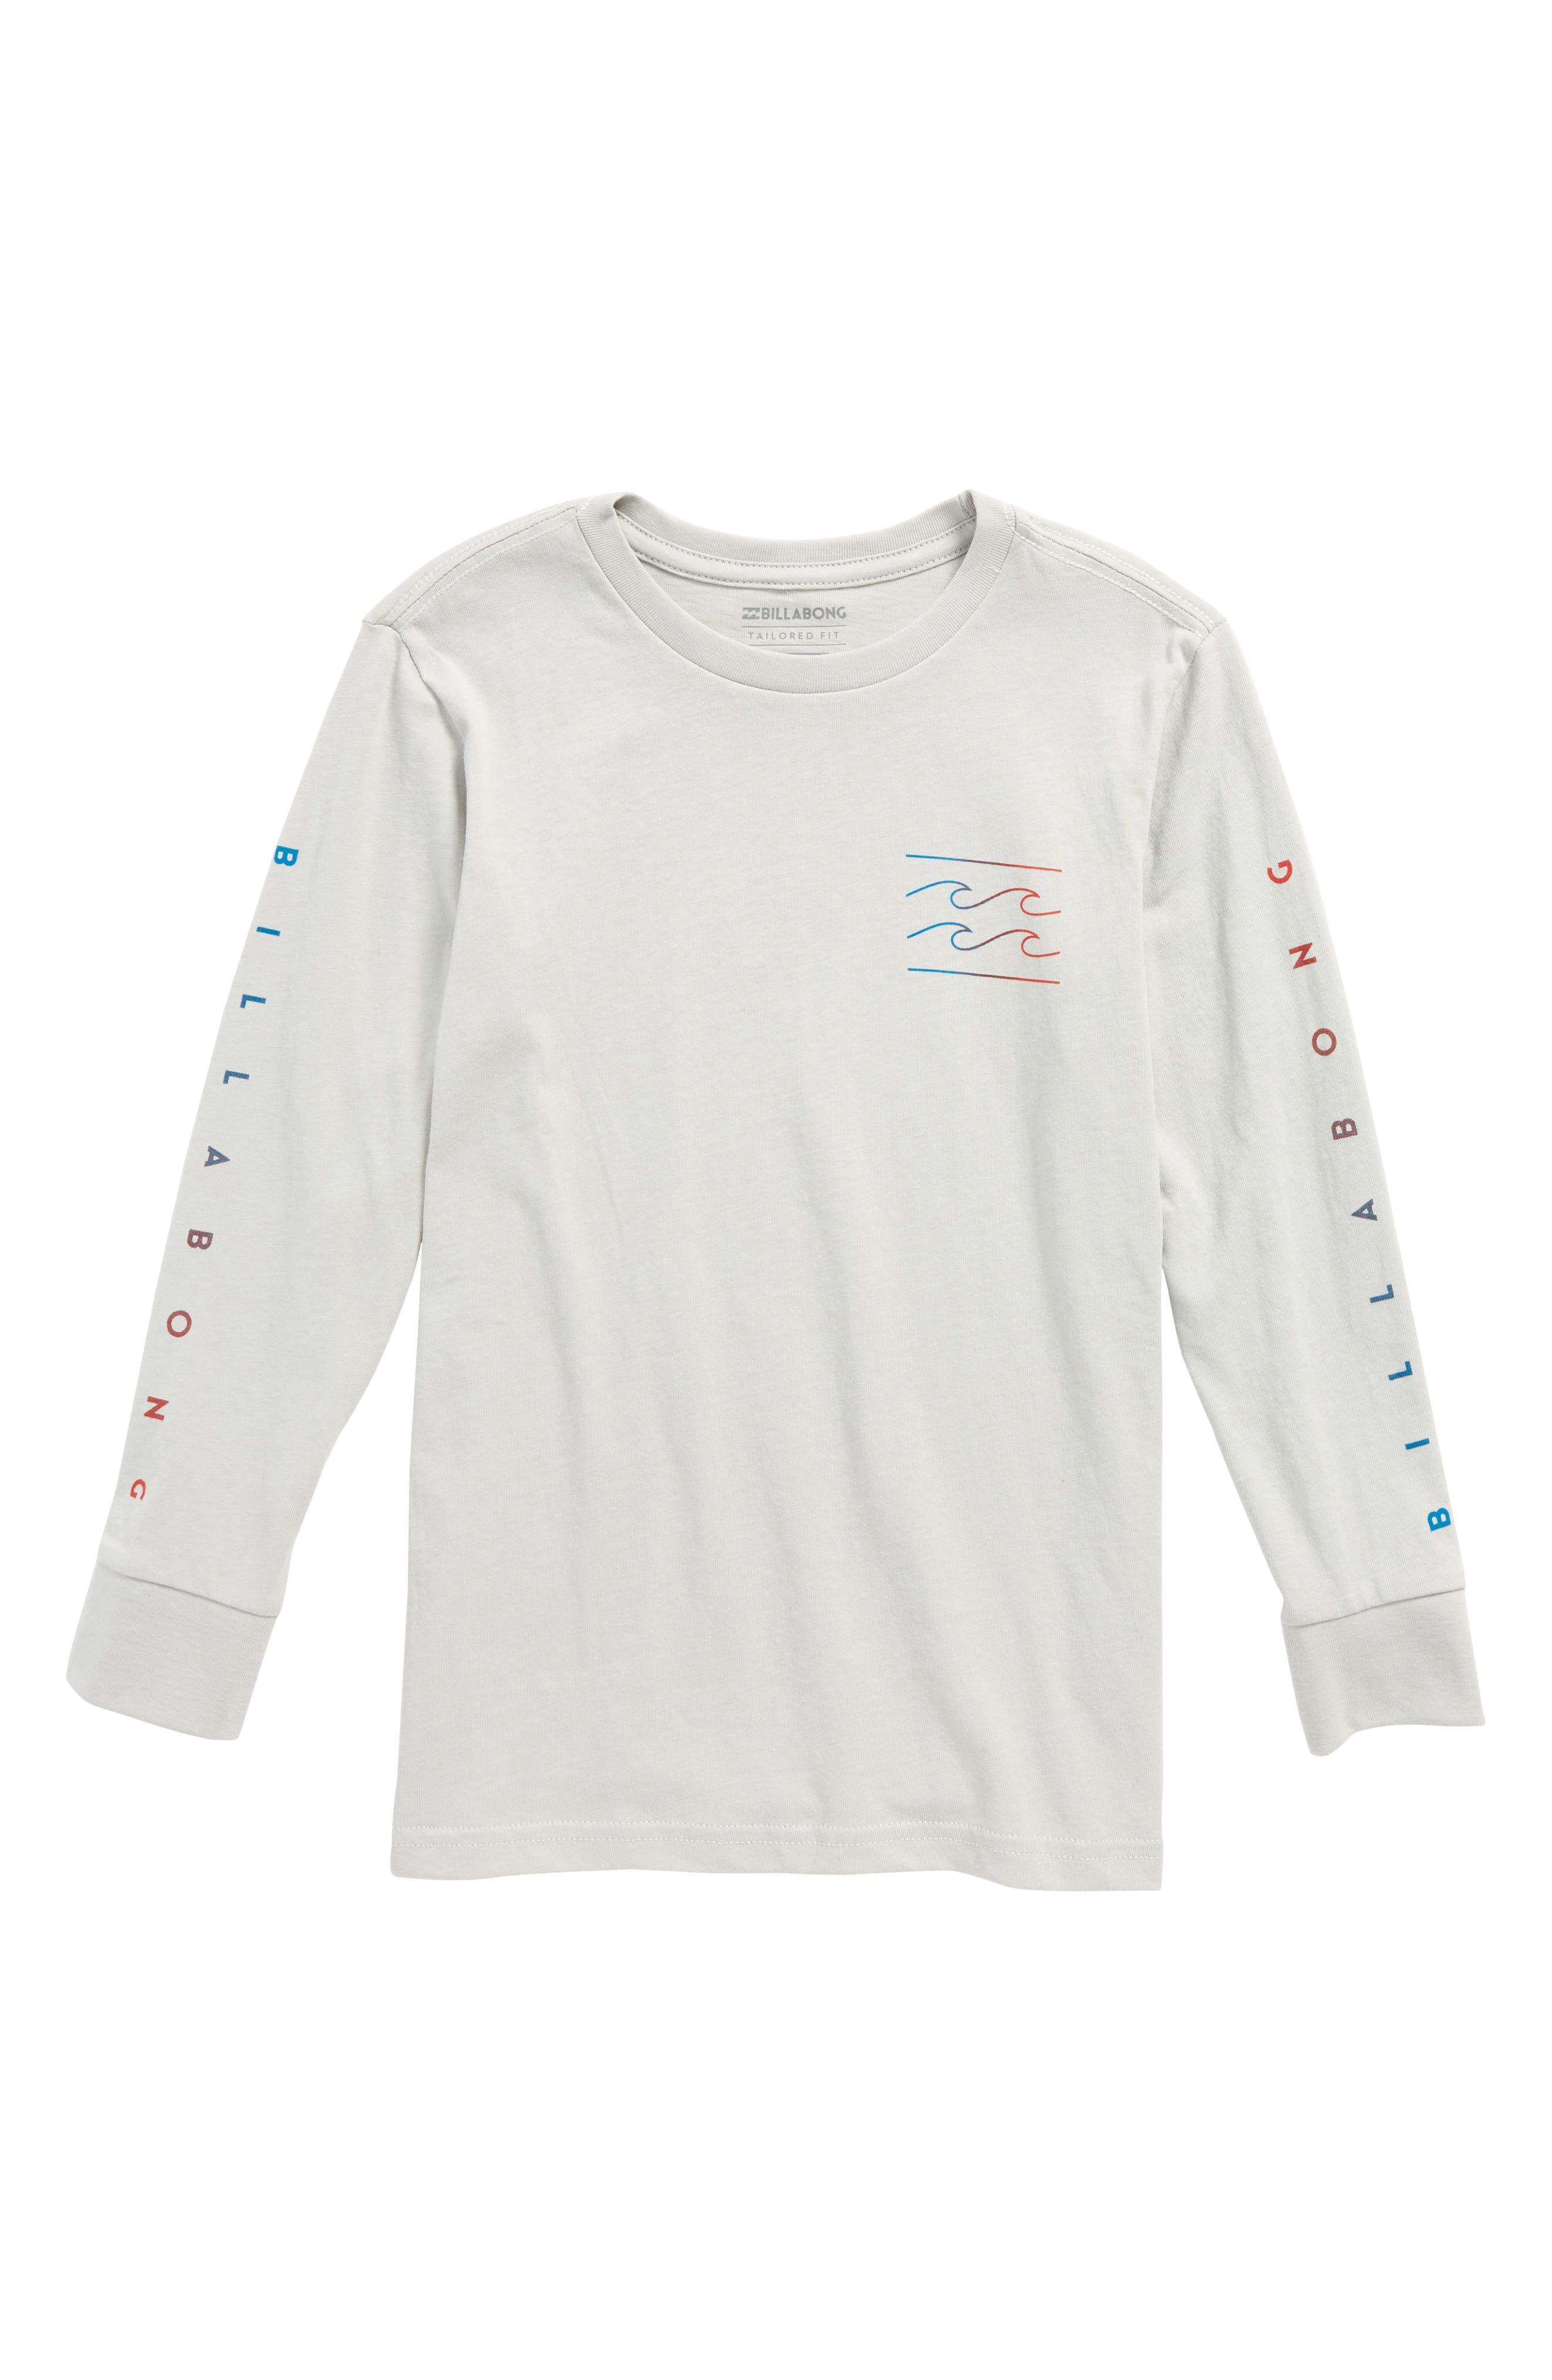 Main Image - Billabong Unity Graphic Long Sleeve T-Shirt (Toddler Boys & Little Boys)